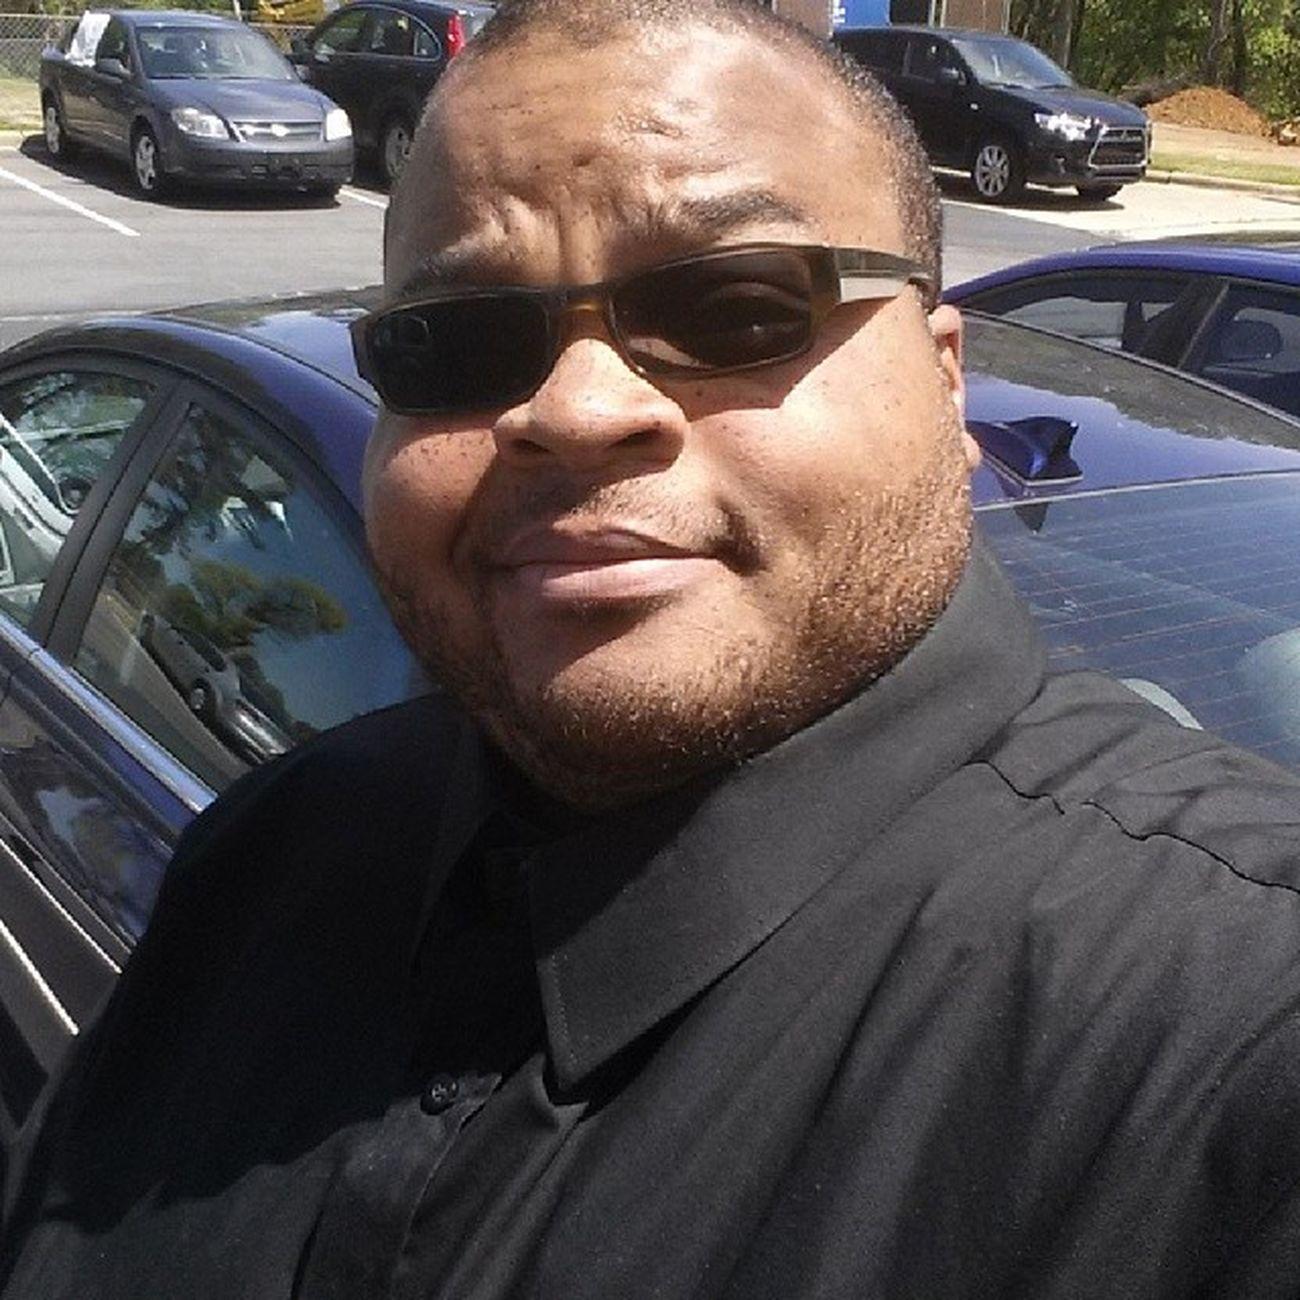 Just got out of Church Letmetakeaselfie Happyeaster Selfie